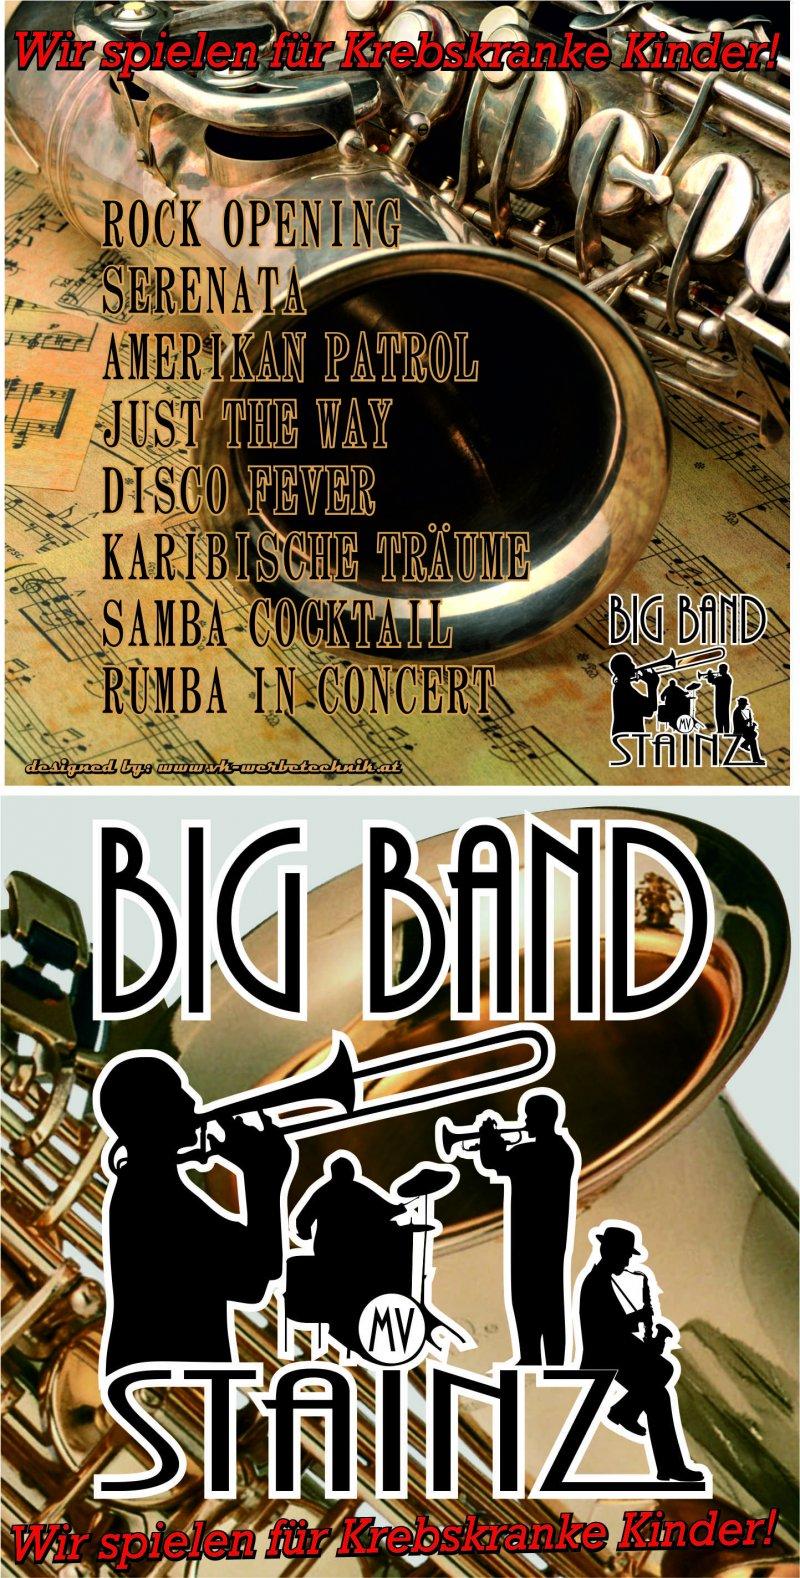 Big-Band-Stainz